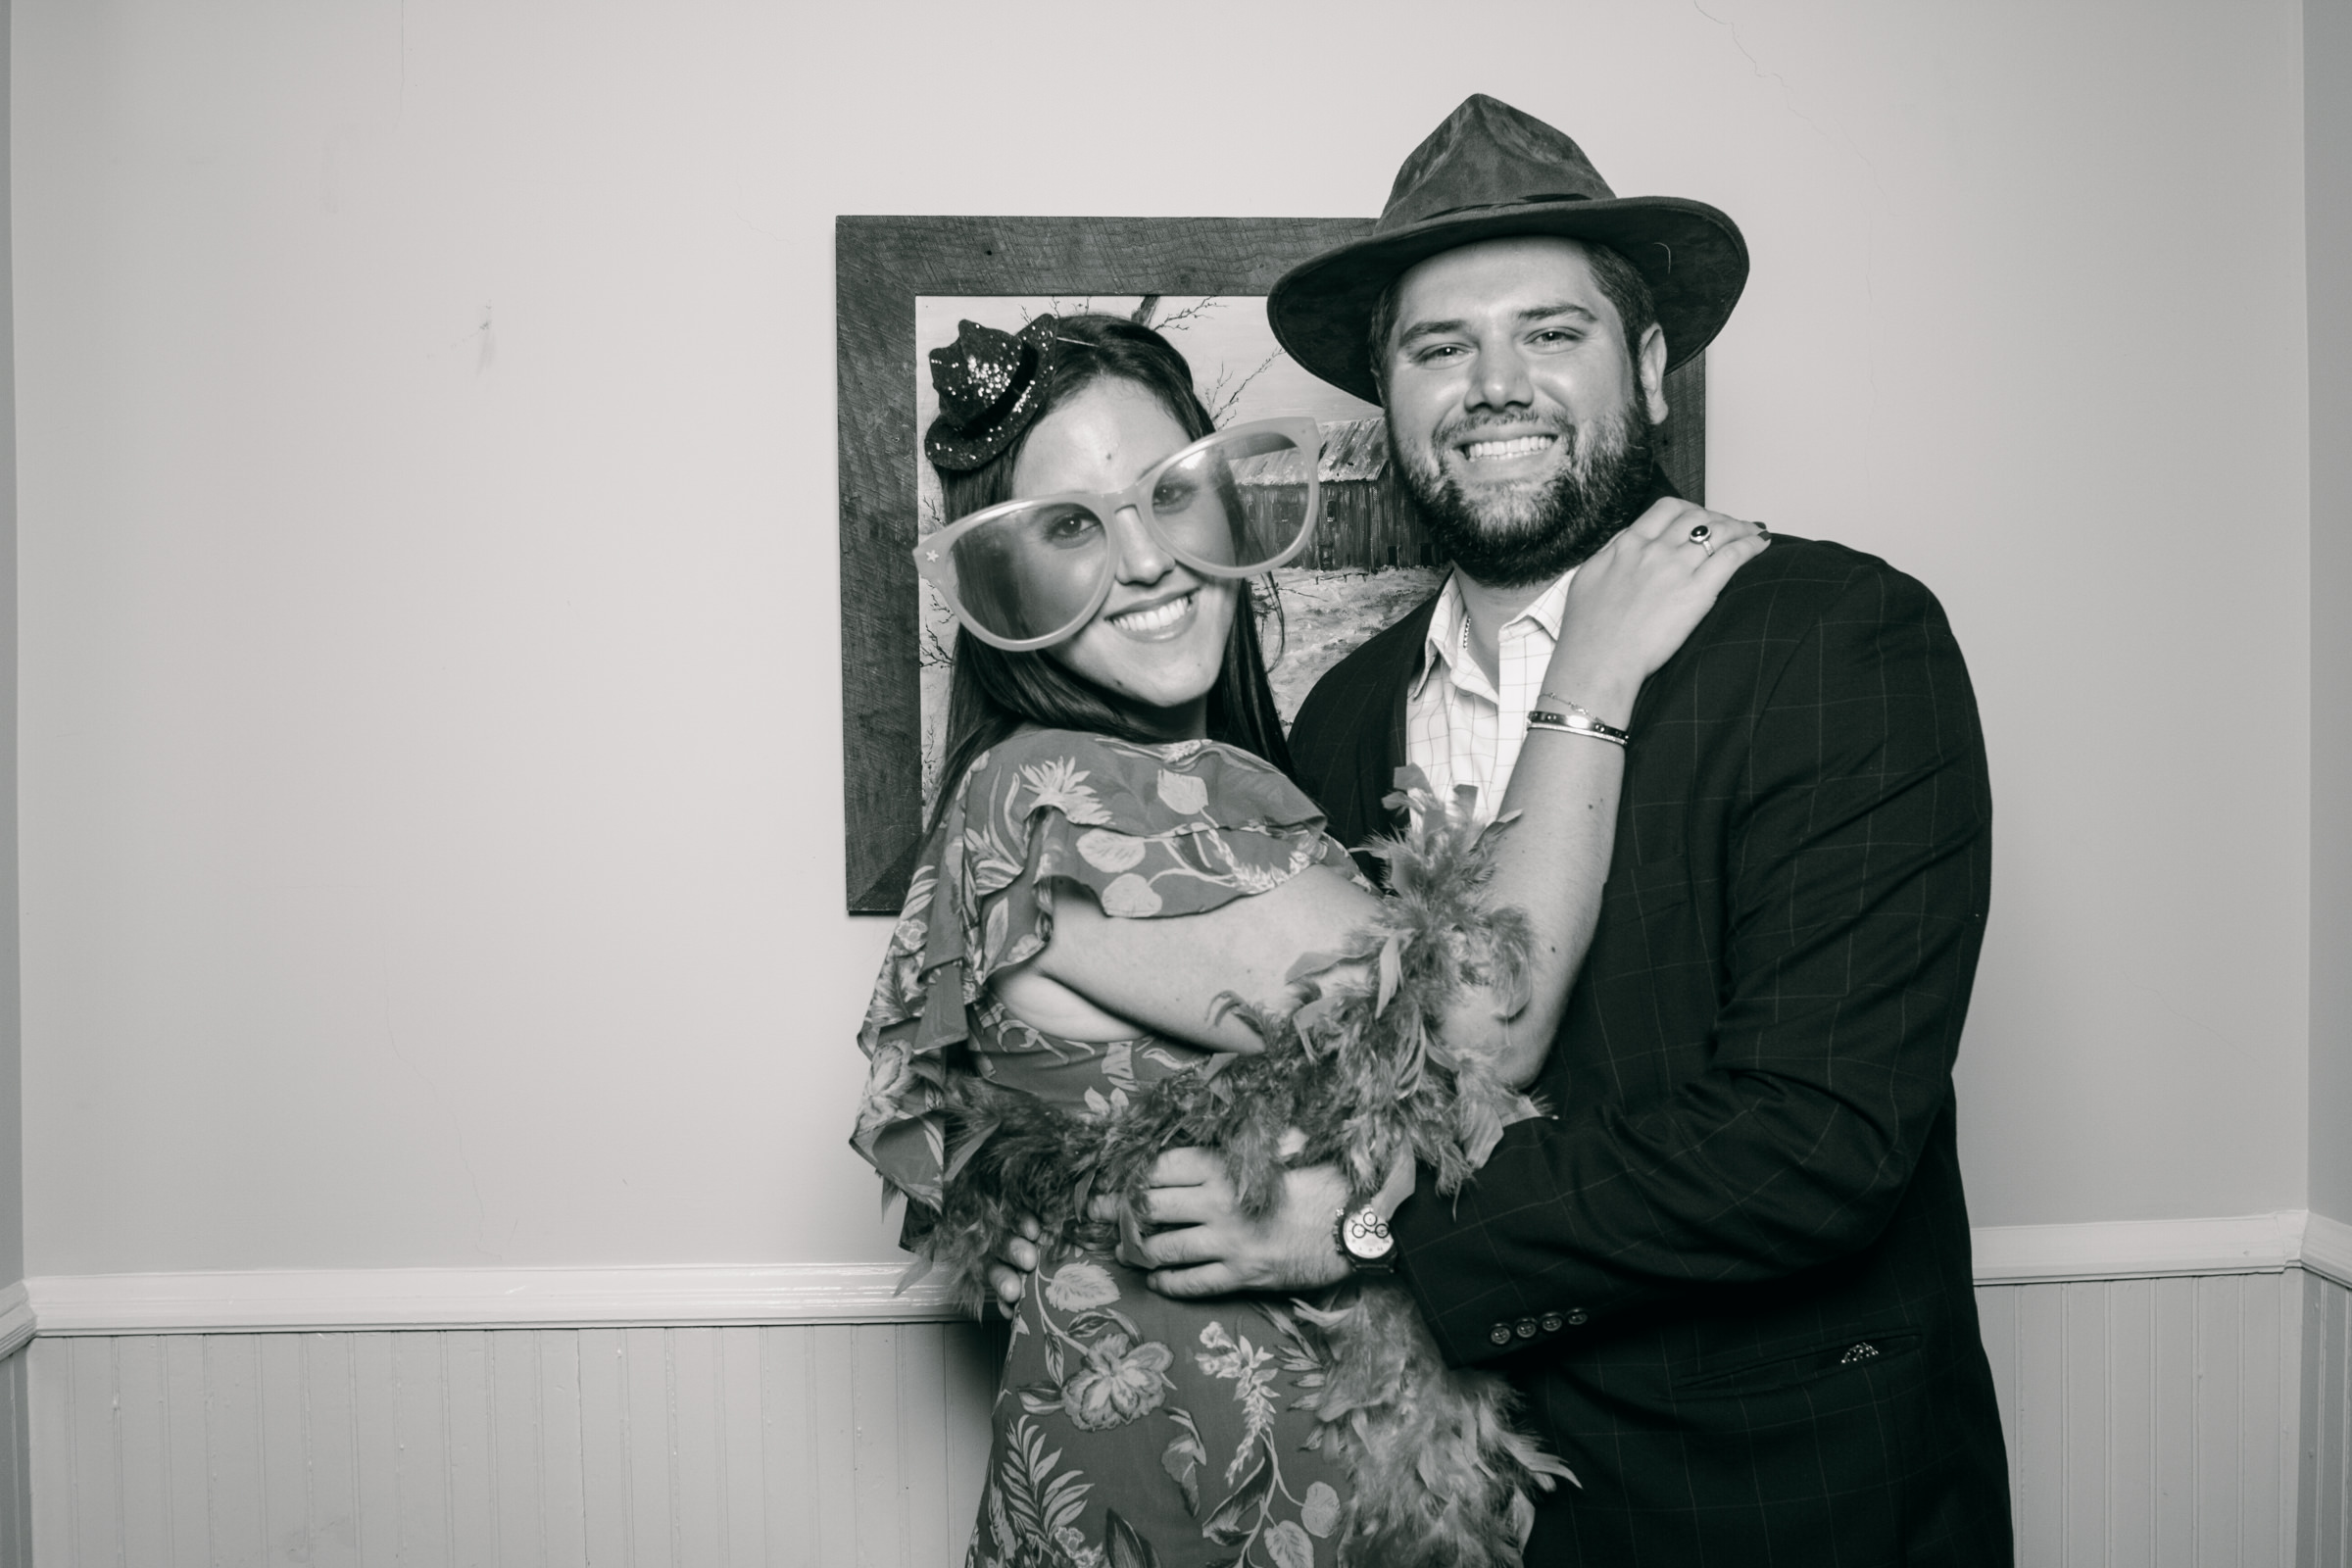 Nicole-Greg-Wedding-Photo-Booth-Lodge-Mountain-Springs-13.jpg